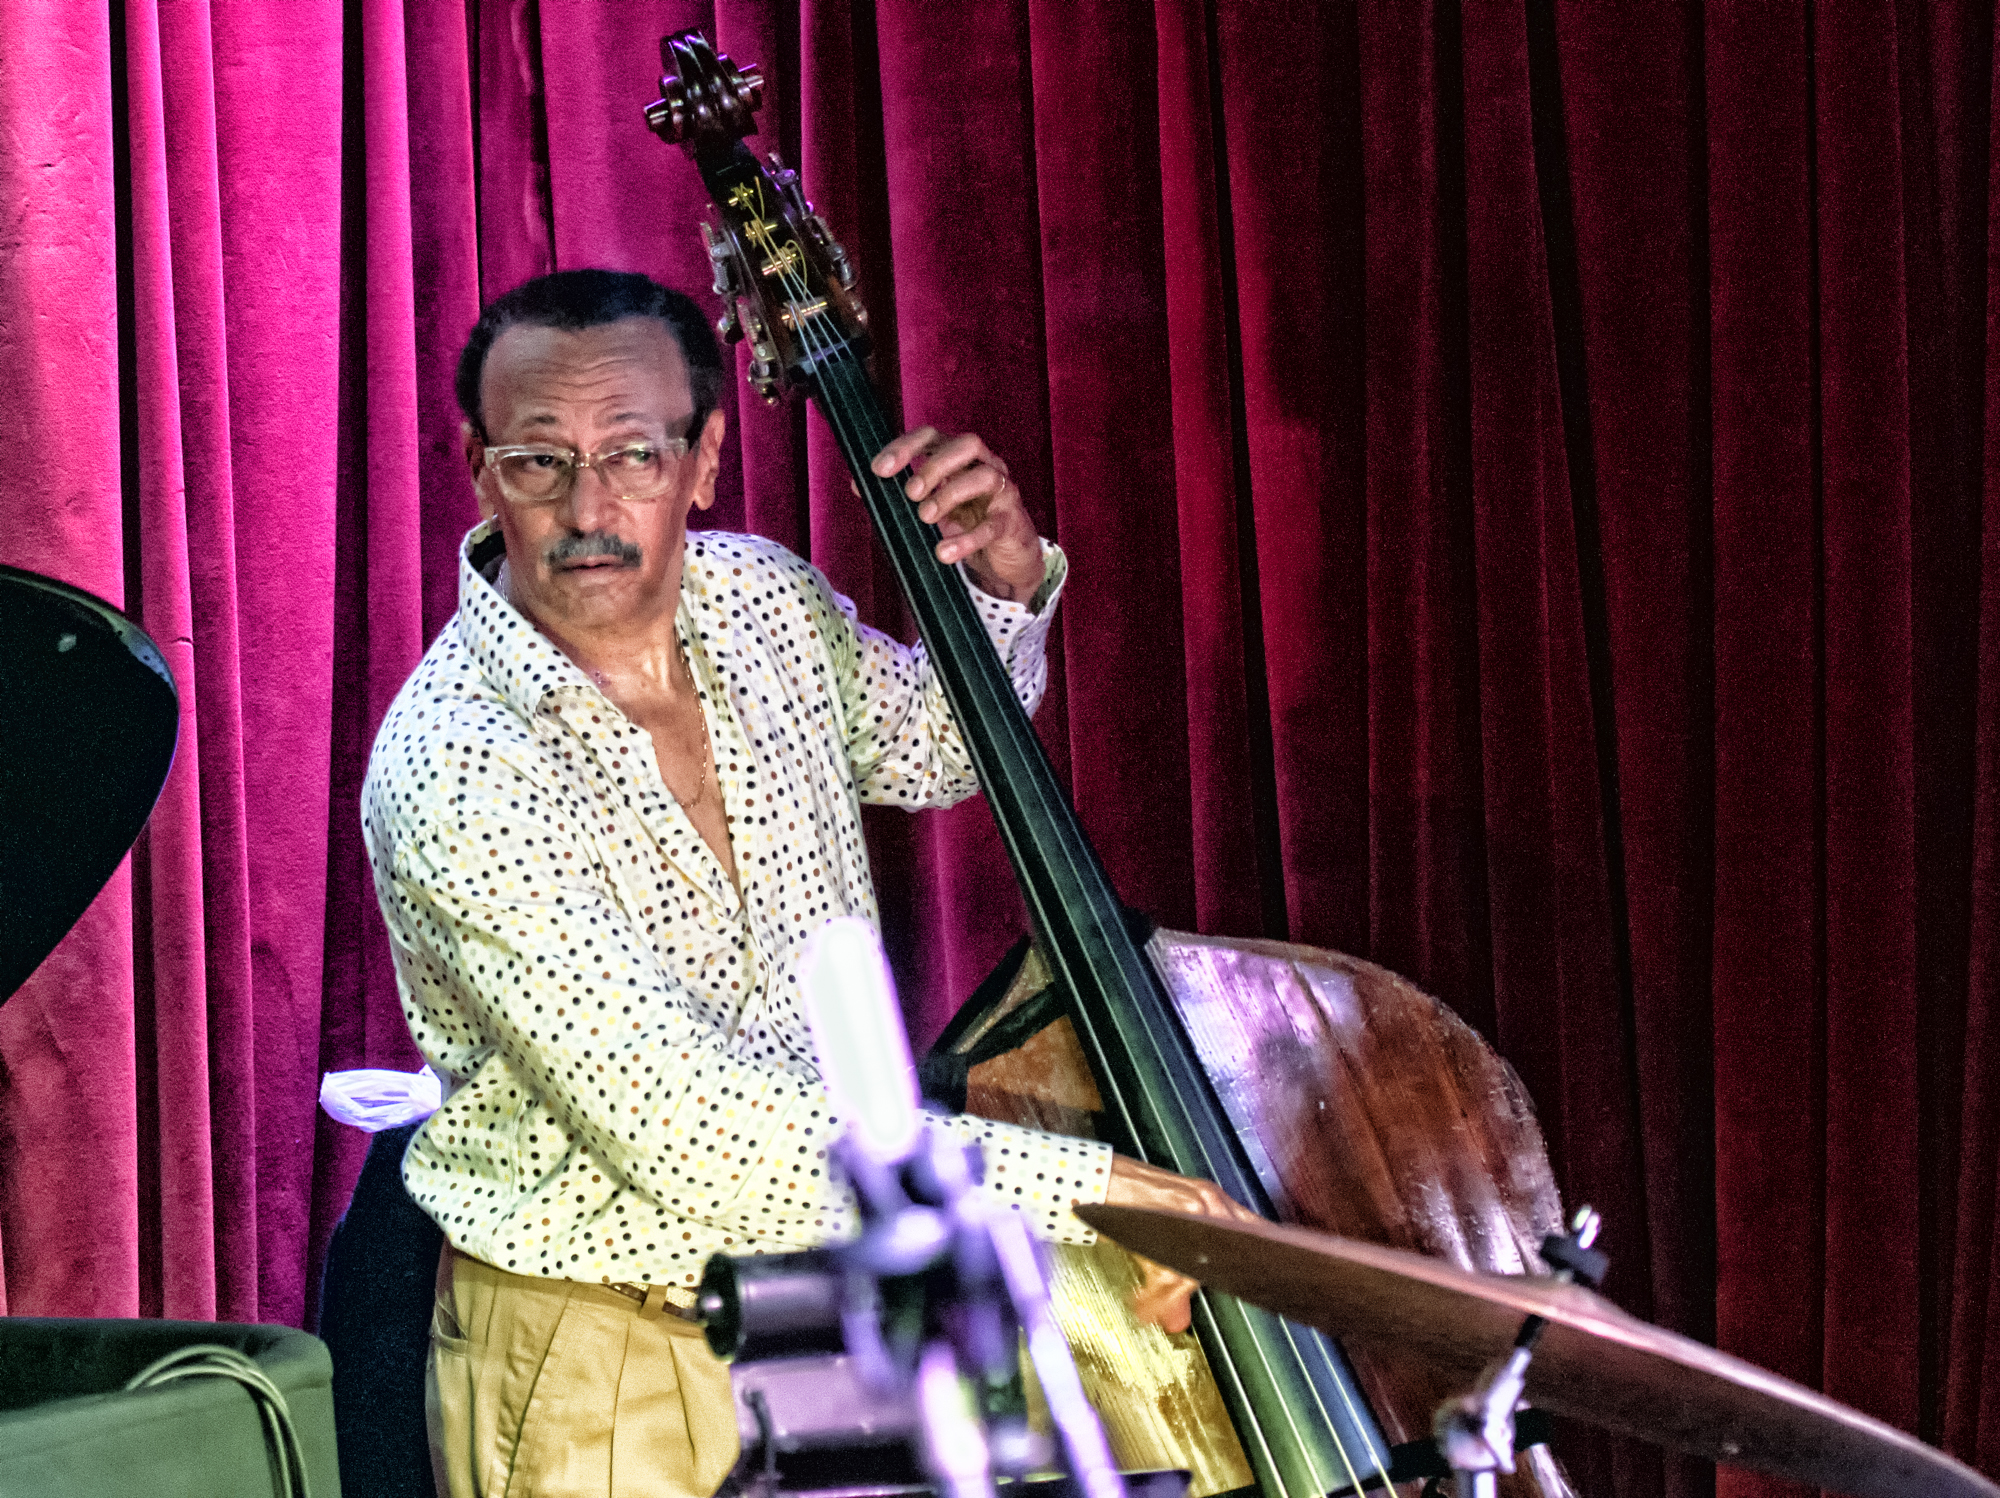 David Williams with the Javon Jackson Quartet at Smoke Jazz Club in New York City